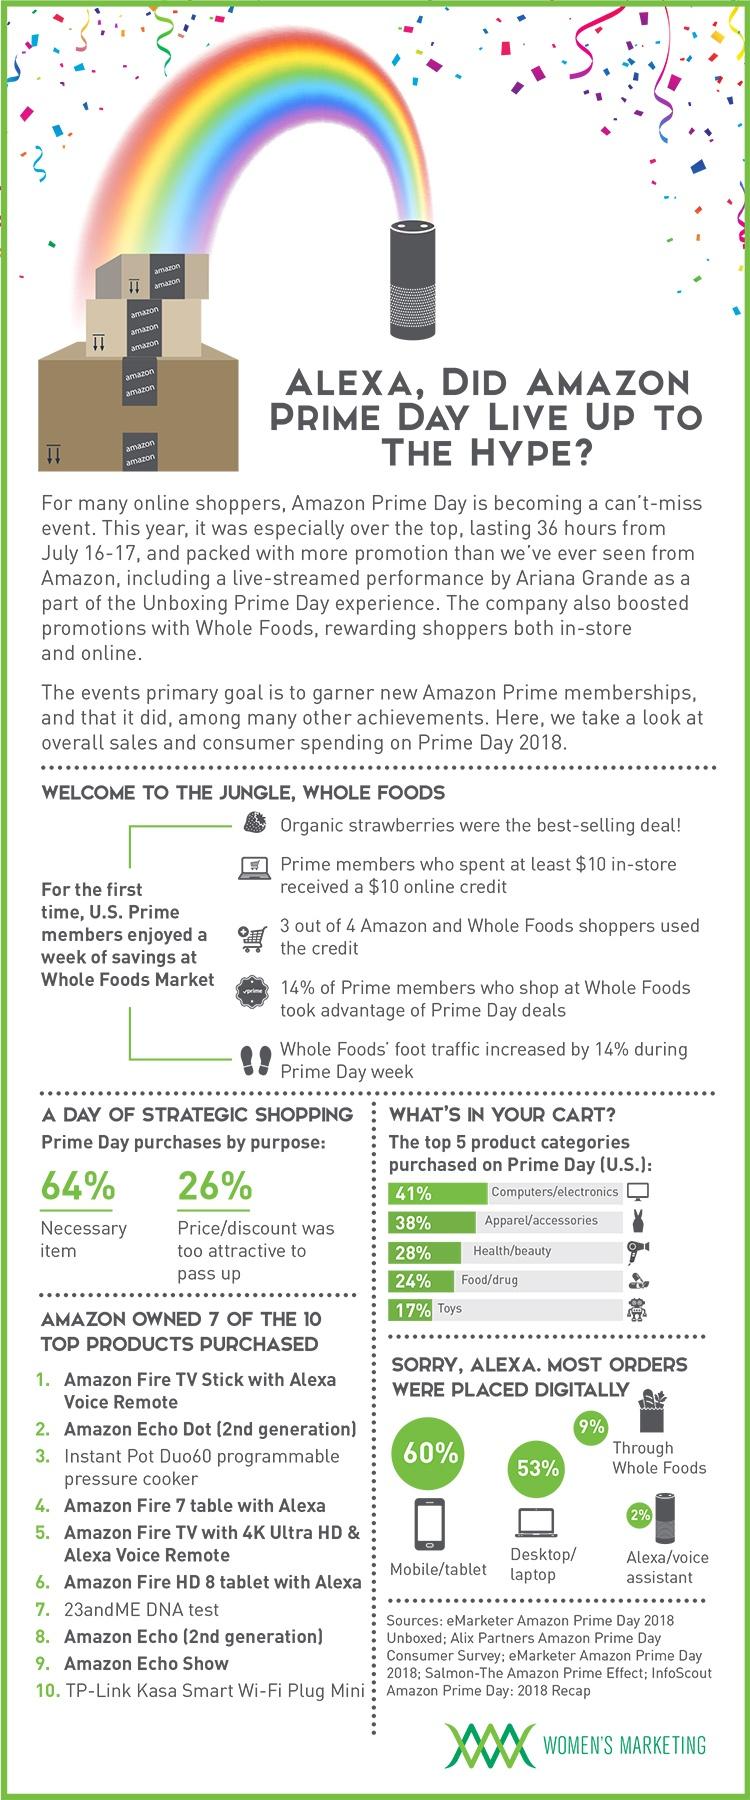 AmazonPrimeDayResults2018_Infographic